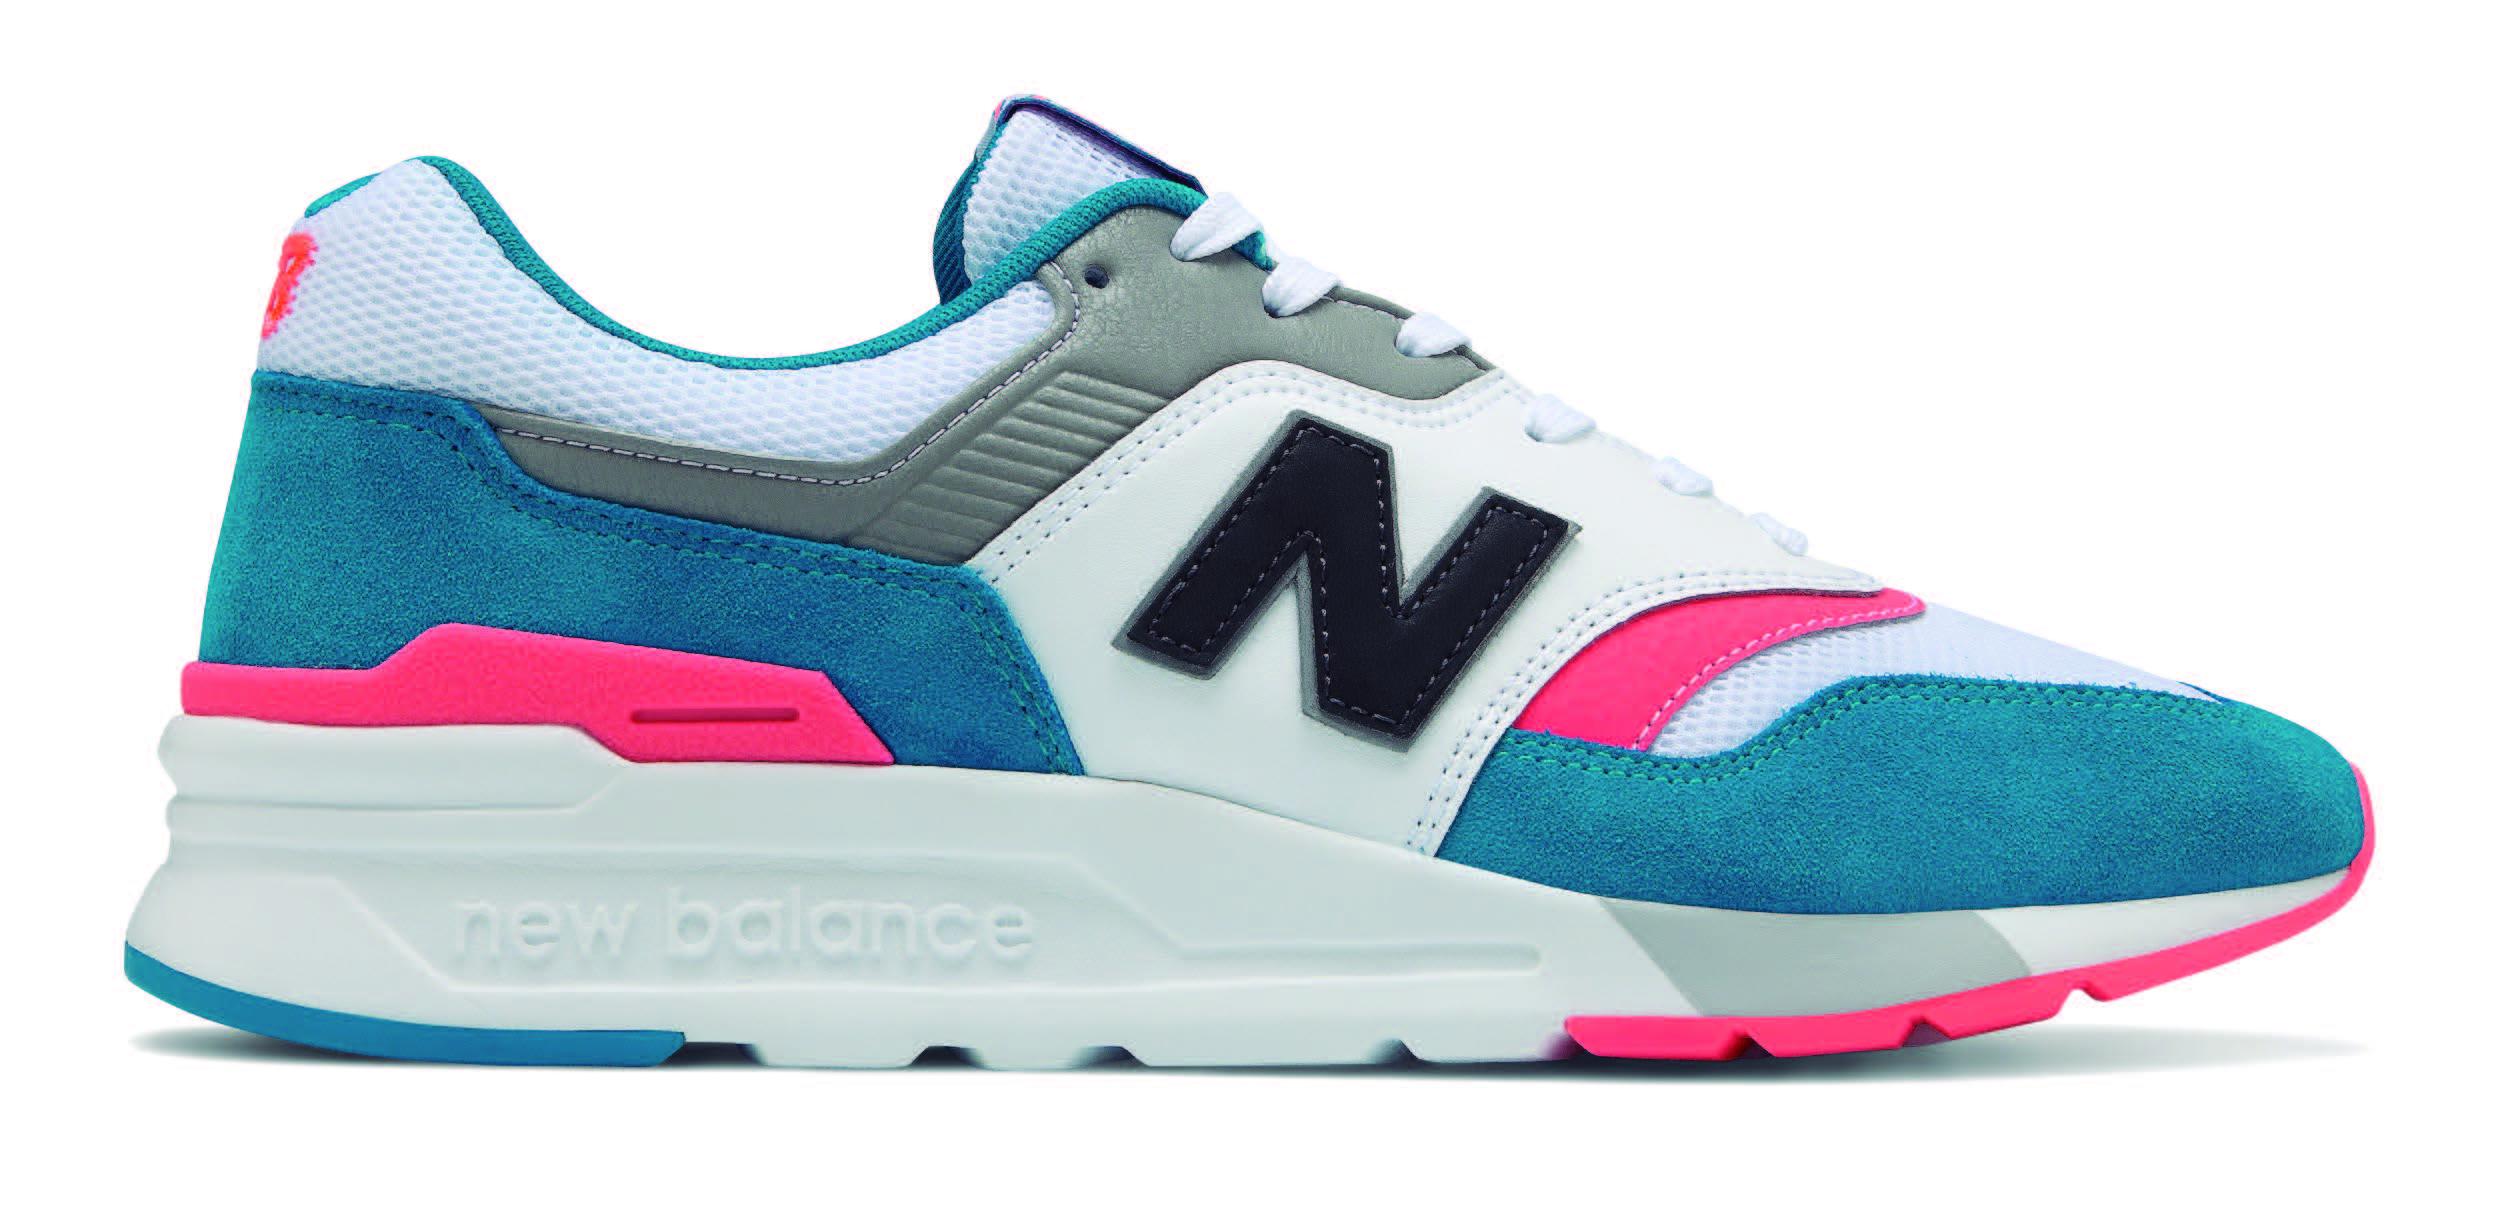 New Balance 997 - Sneakers Magazine